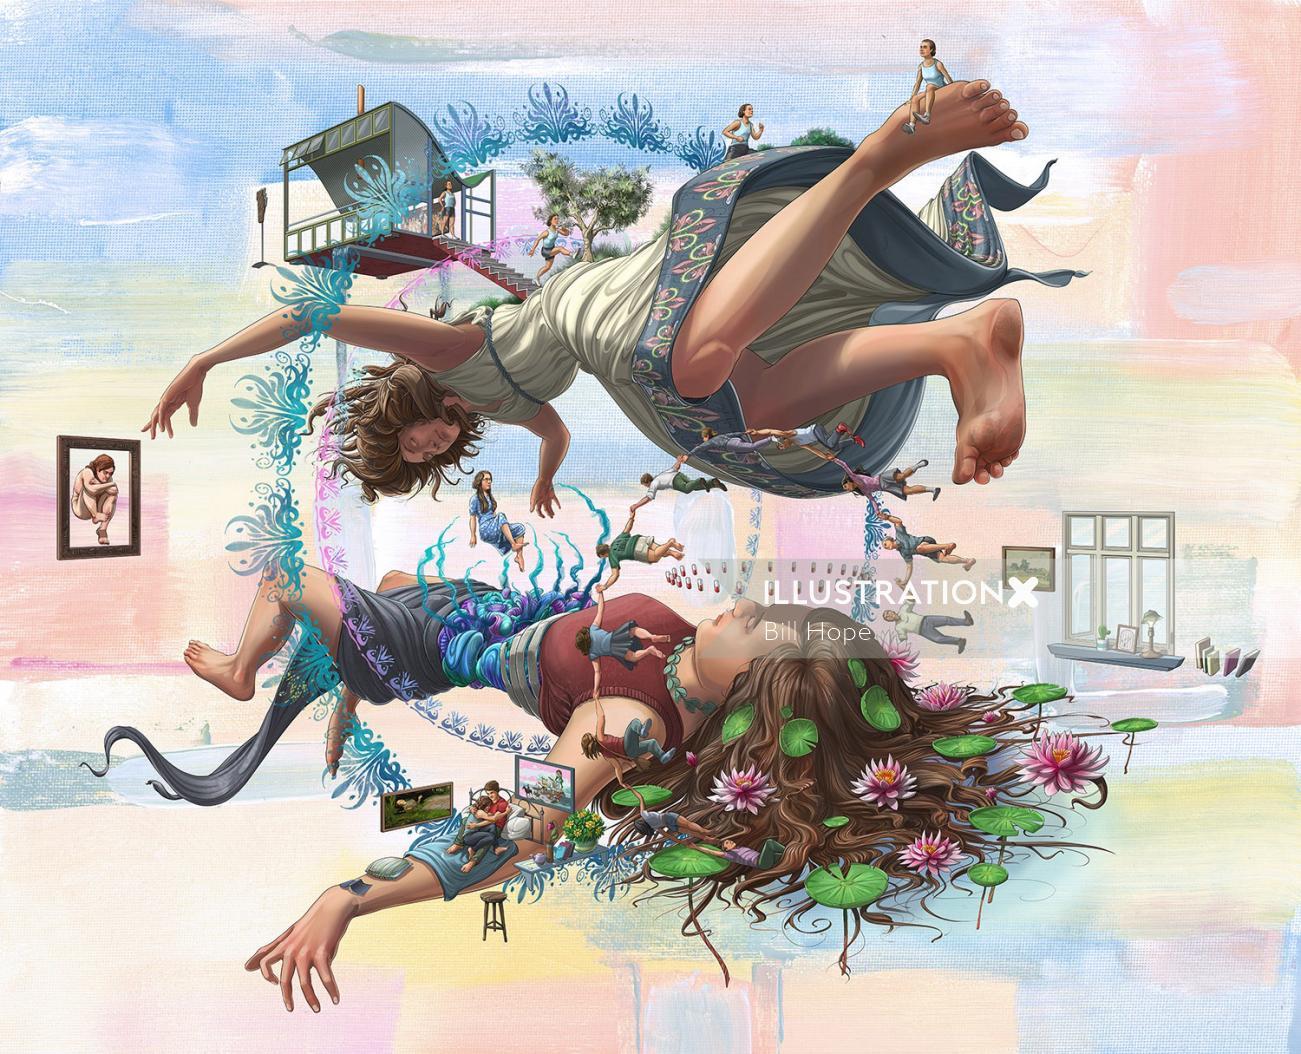 Fantasy Illustration Of Children